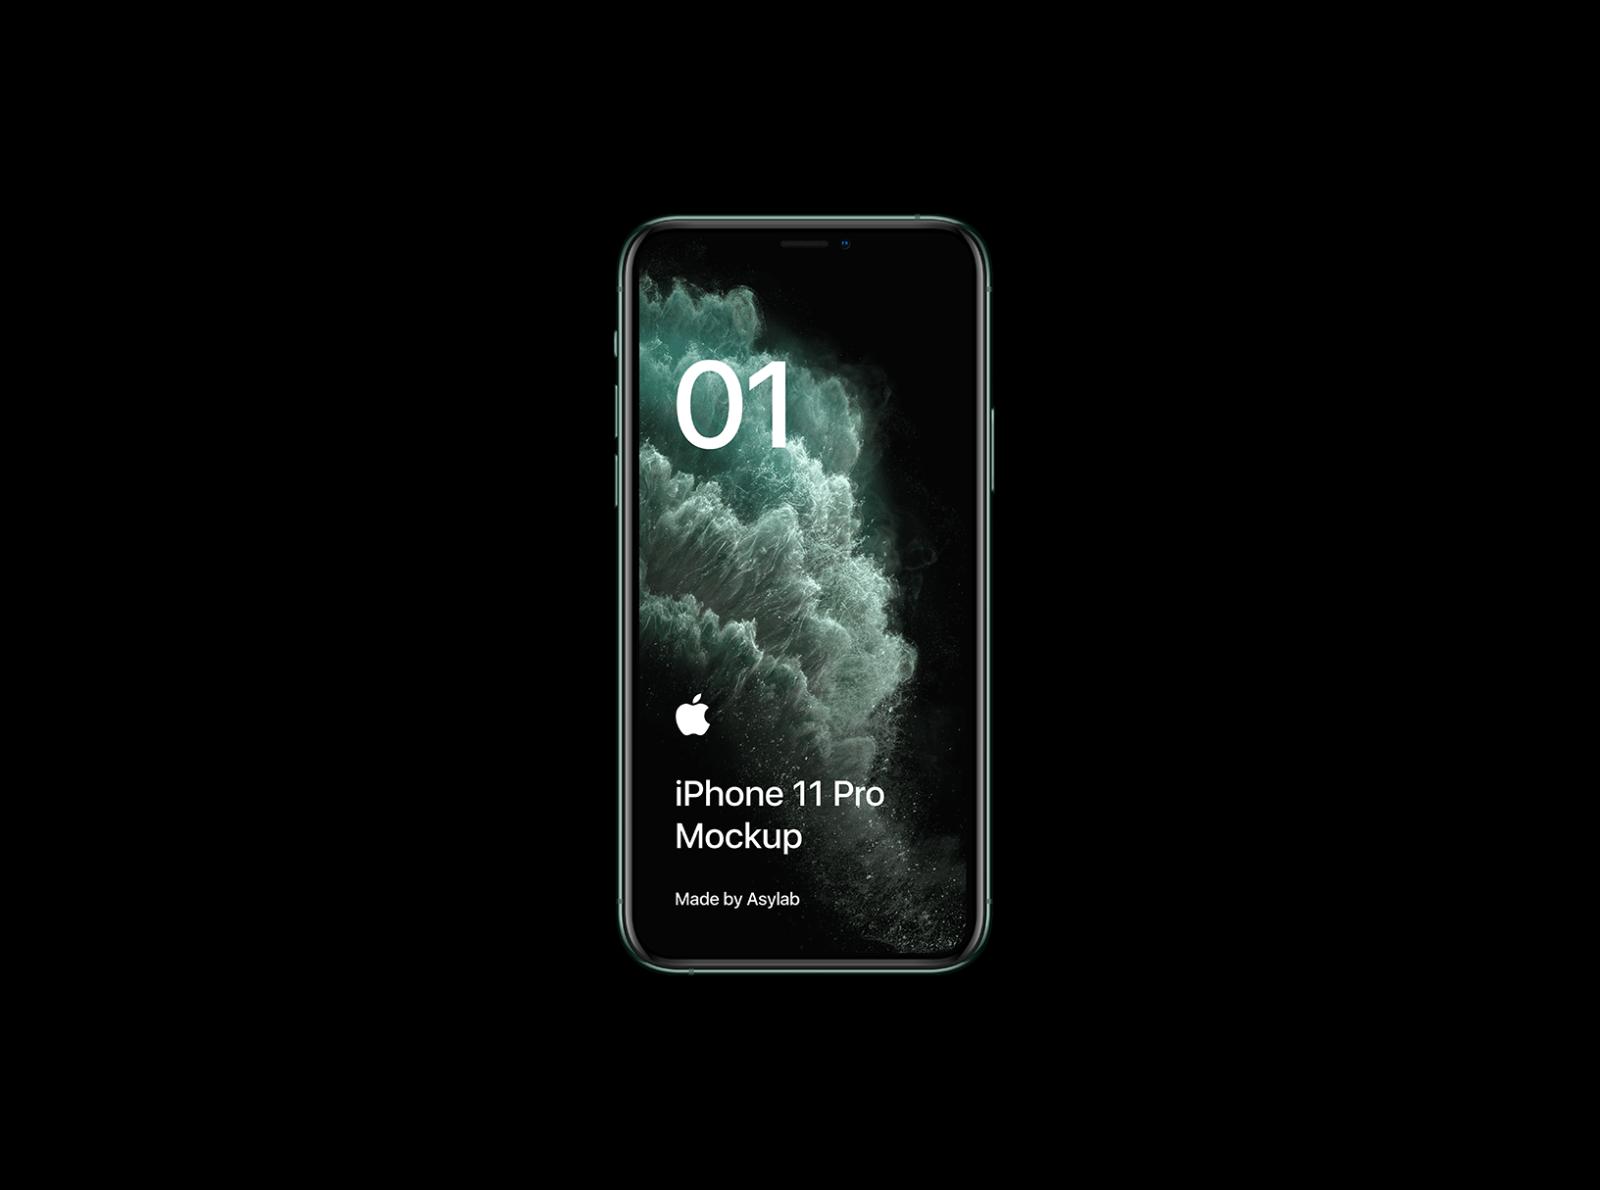 Freebie Iphone 11 Pro Mockup Psd By Asylab On Dribbble